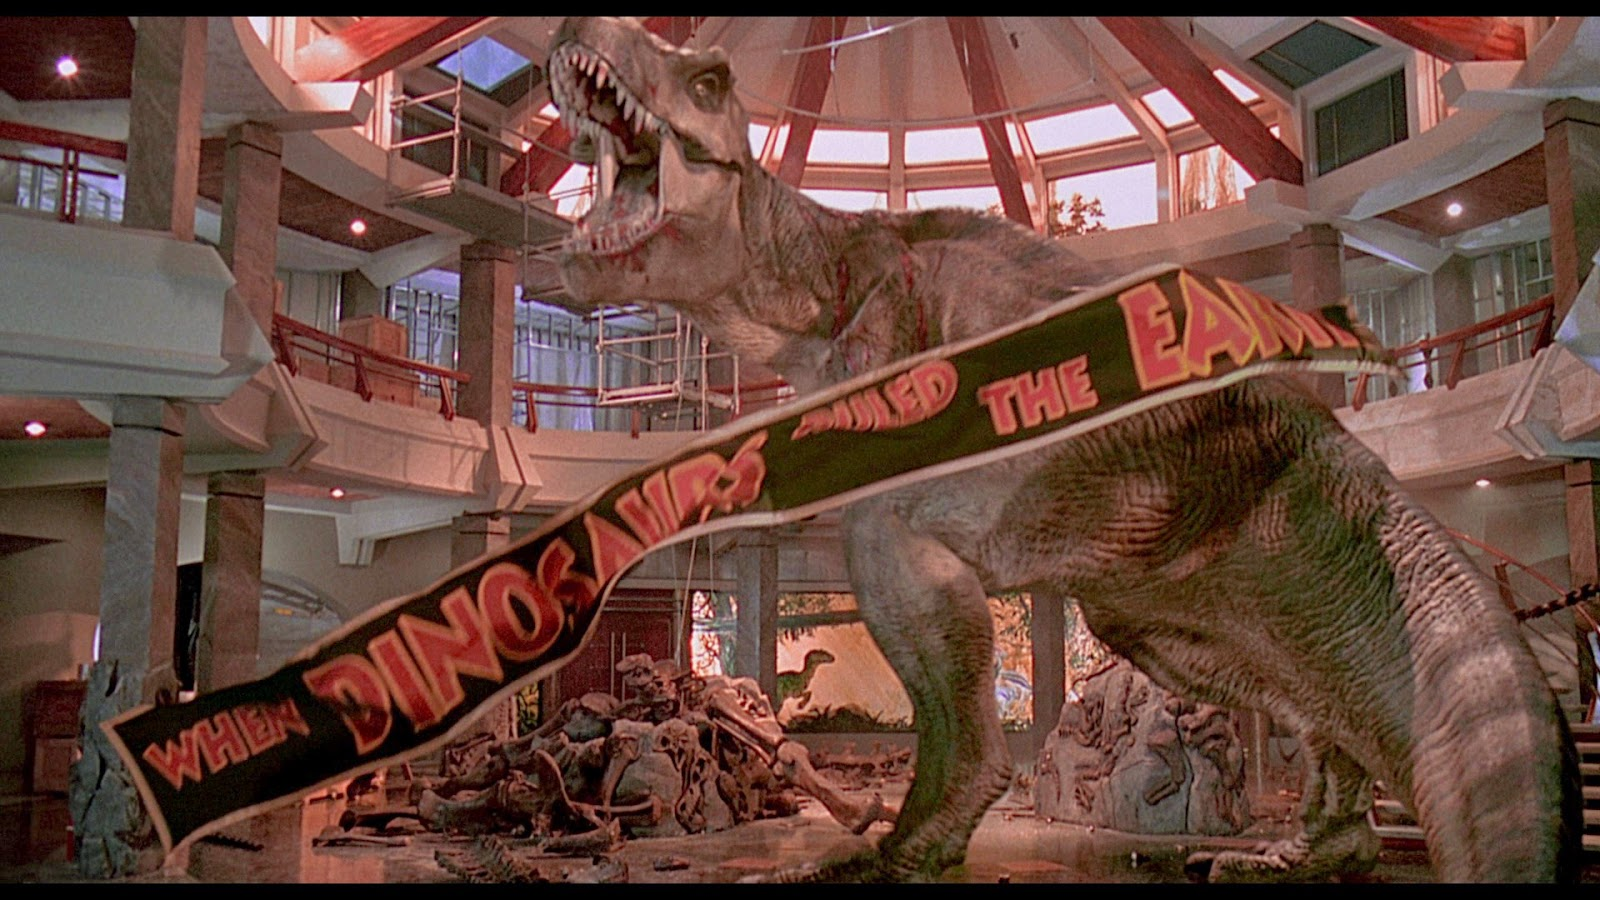 Jurassic Park finale t-rex